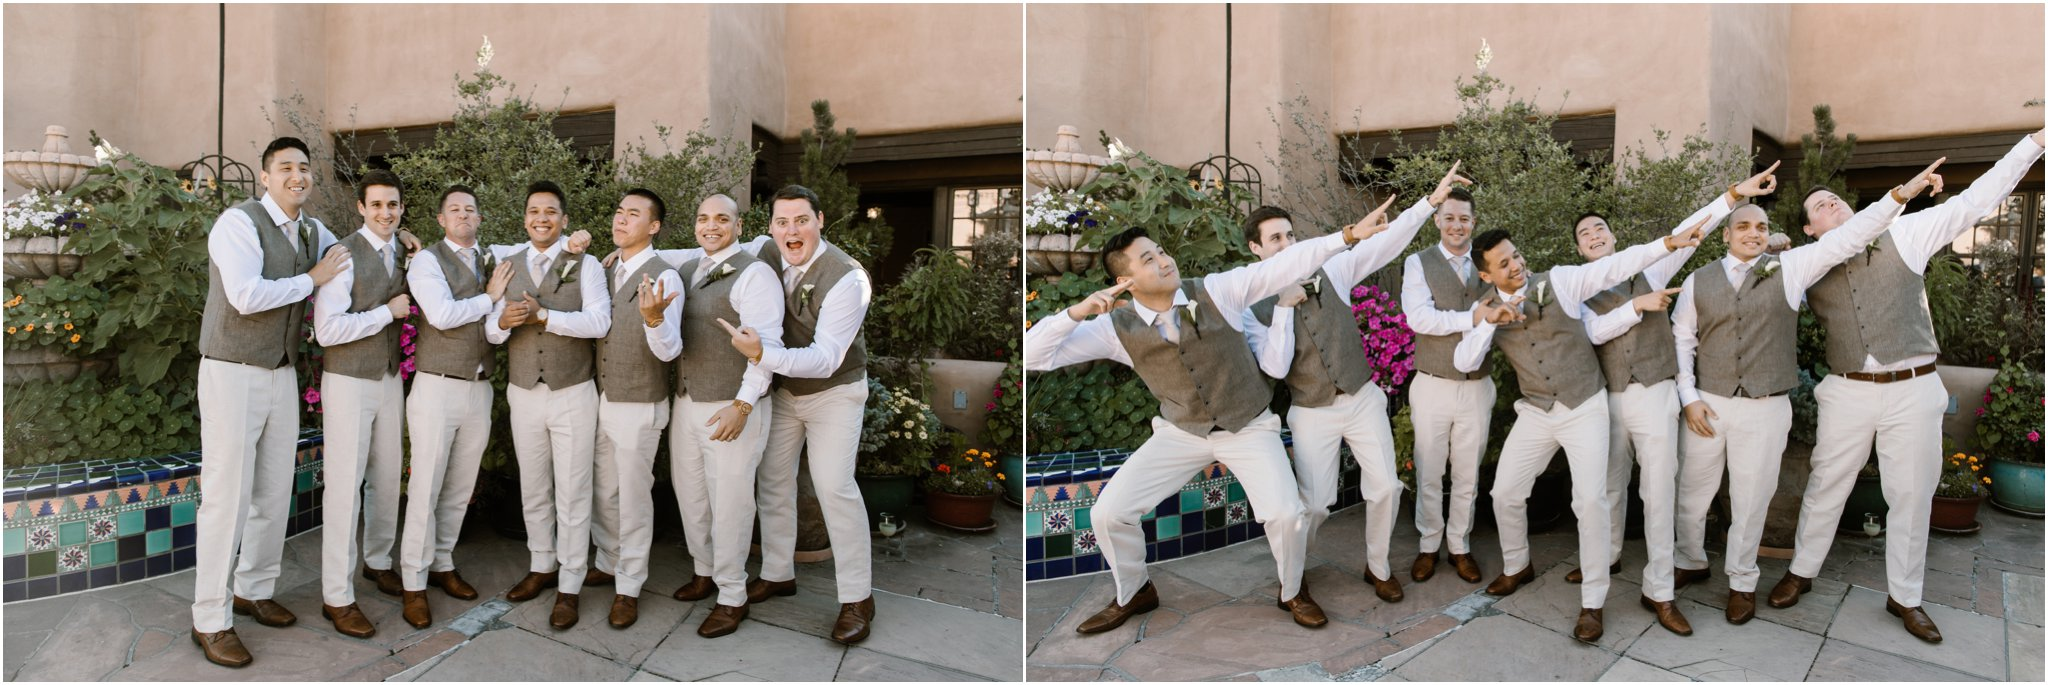 0041La Fonda Weddings Blue Rose Photography Studios